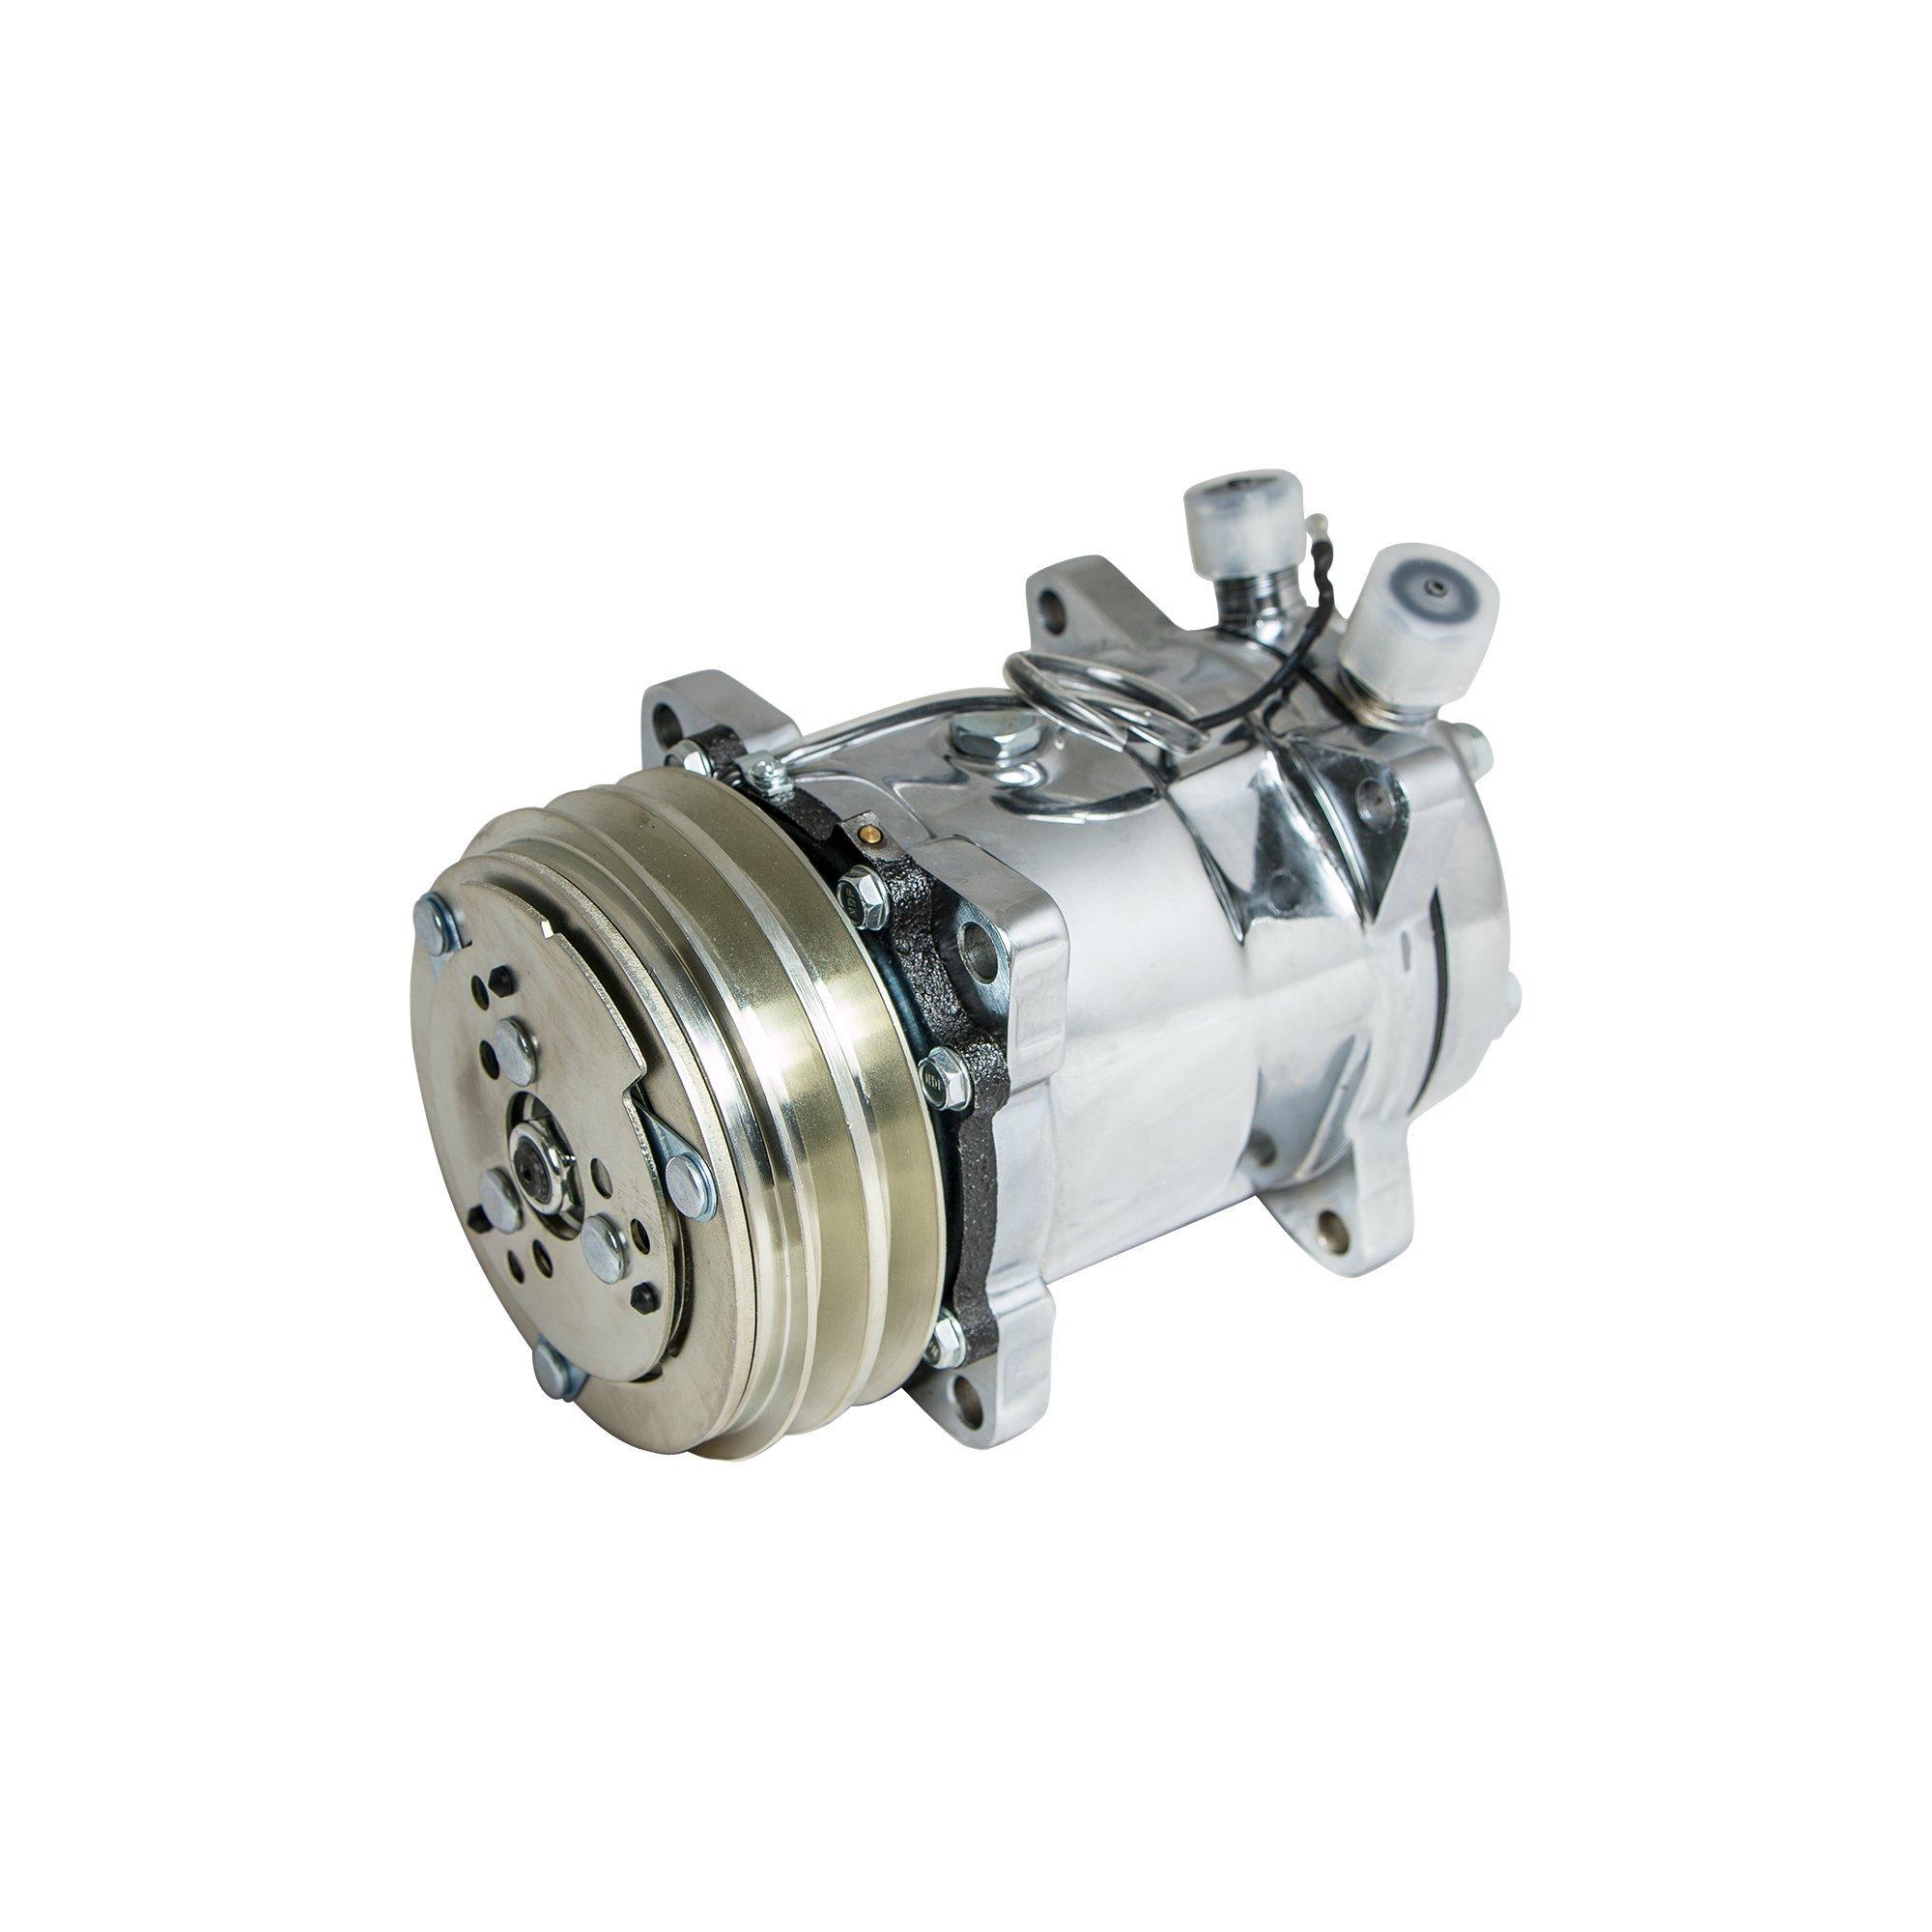 Top Street Performance HC5003C A/C Compressor with Silver Clutch (Chromed V-Belt Sanden 508 R134A Type)